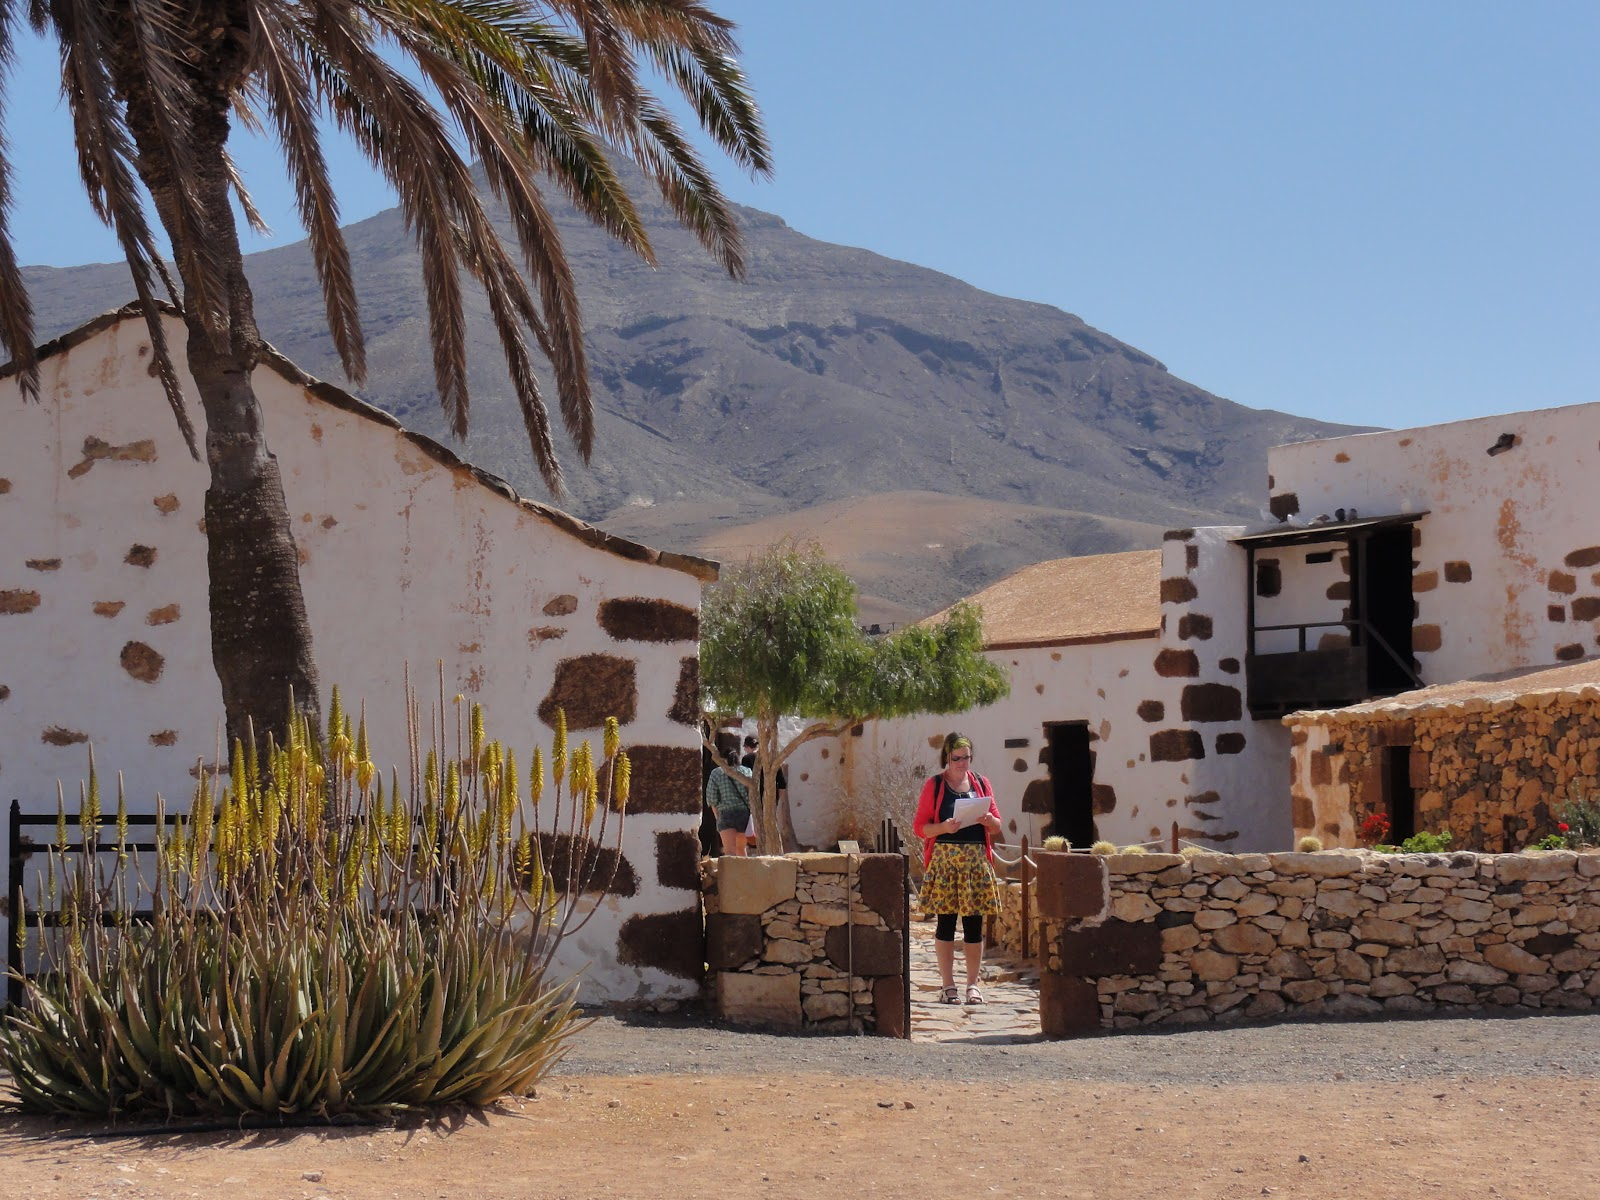 Toosoveral: Fuerteventura